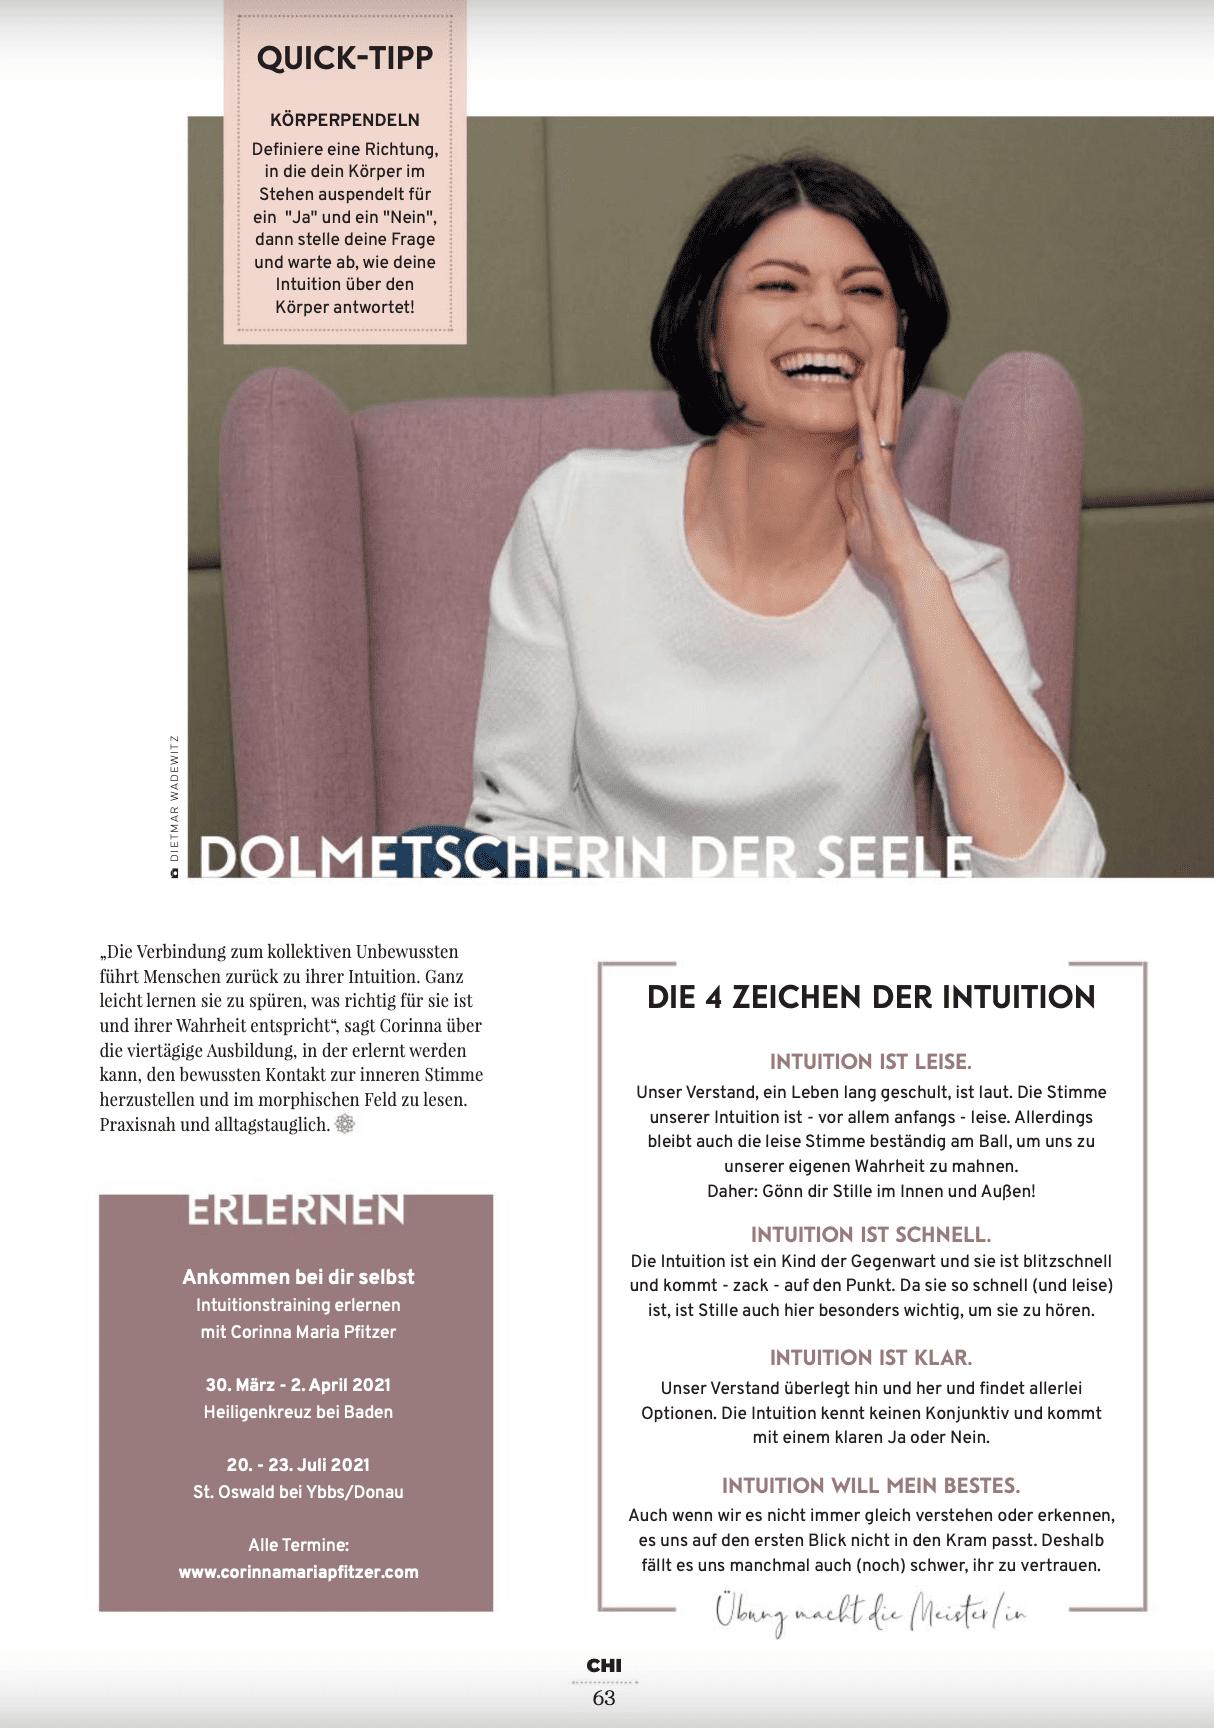 Chi-Magazin-Interview-Intuition-Corinna-Maria-Pfitzer-4